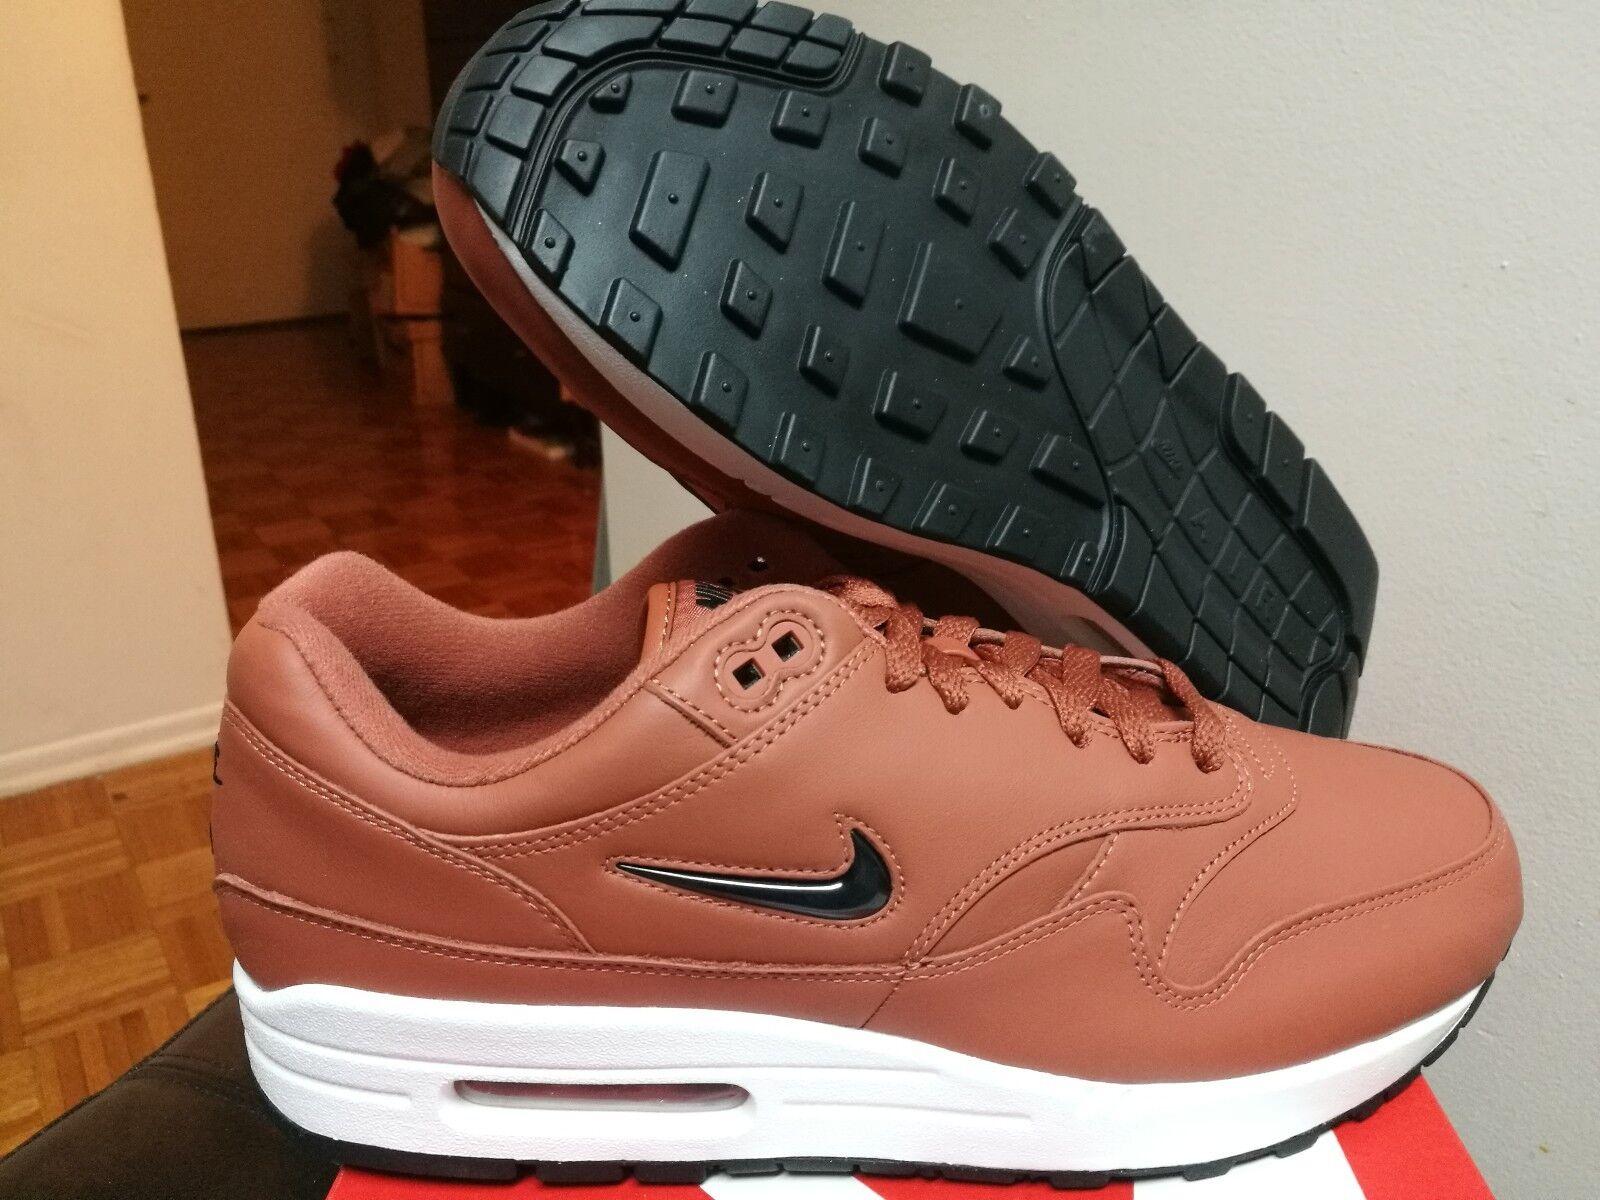 Men's Nike Air Max 1 Premium SC Jewel Dusty Peach Black White 918354-200